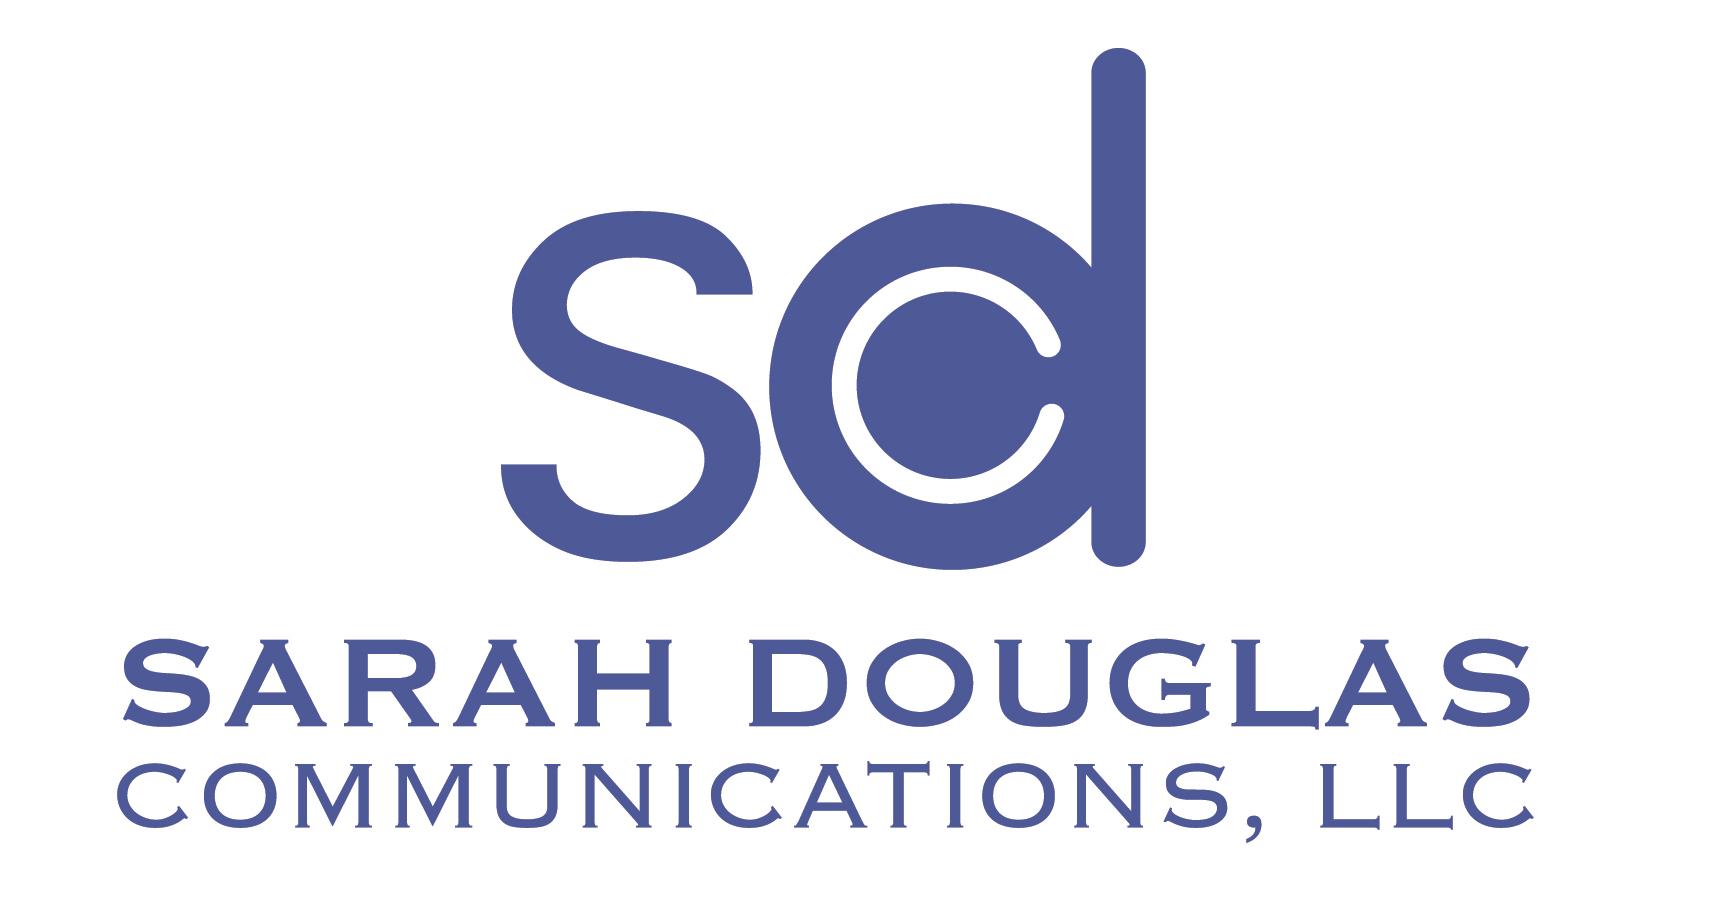 Sarah Douglas Communications